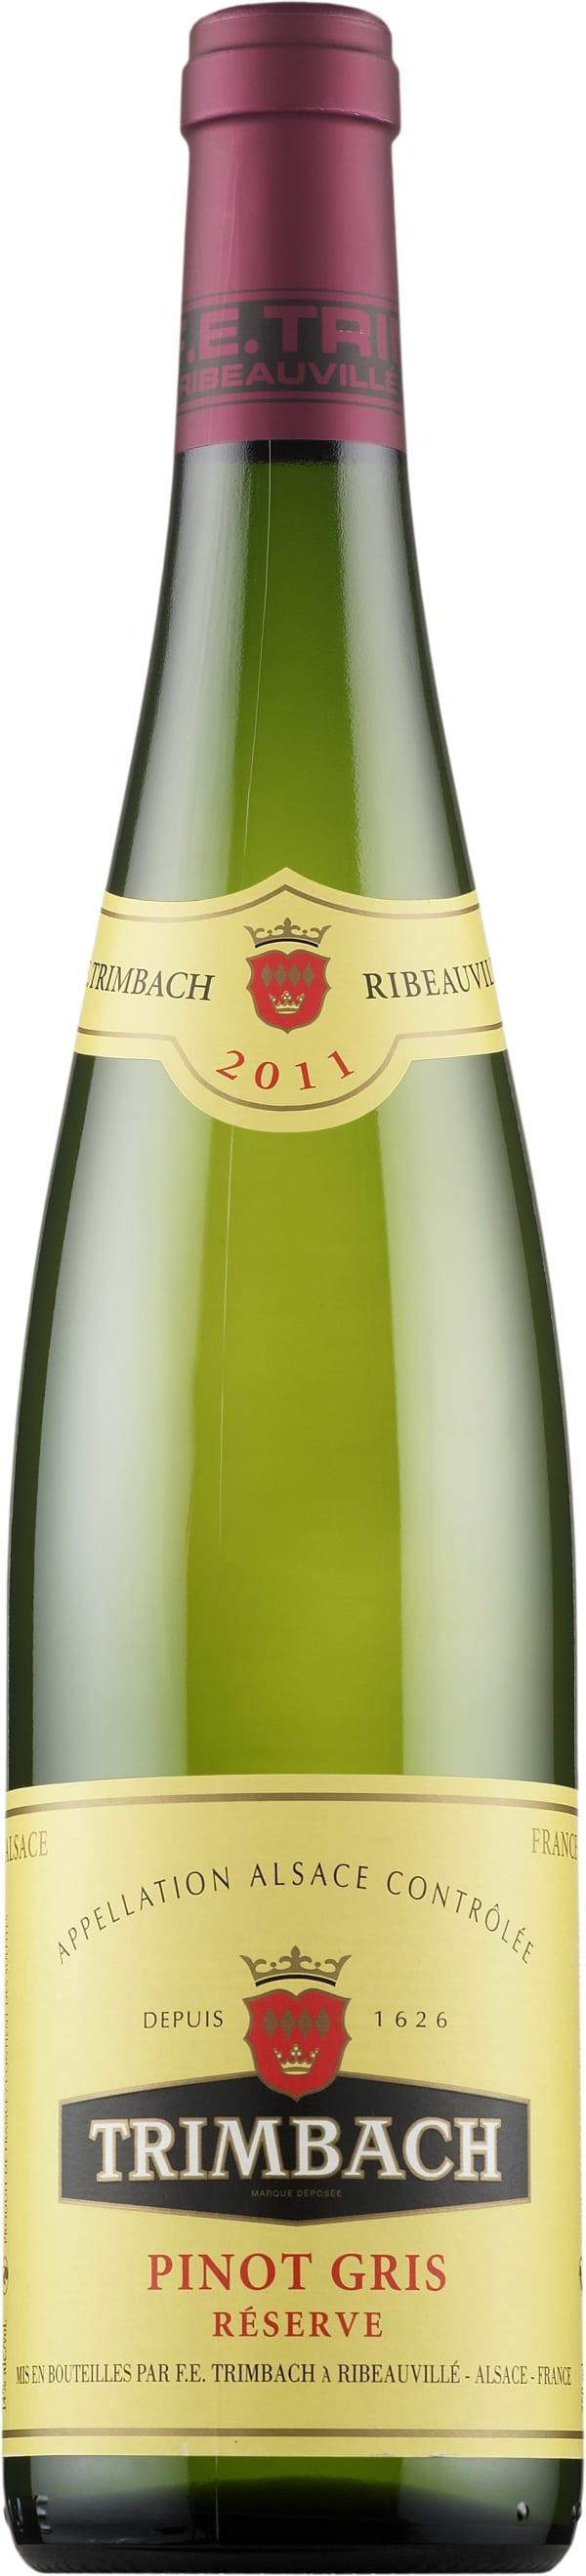 Trimbach Pinot Gris Réserve 2015